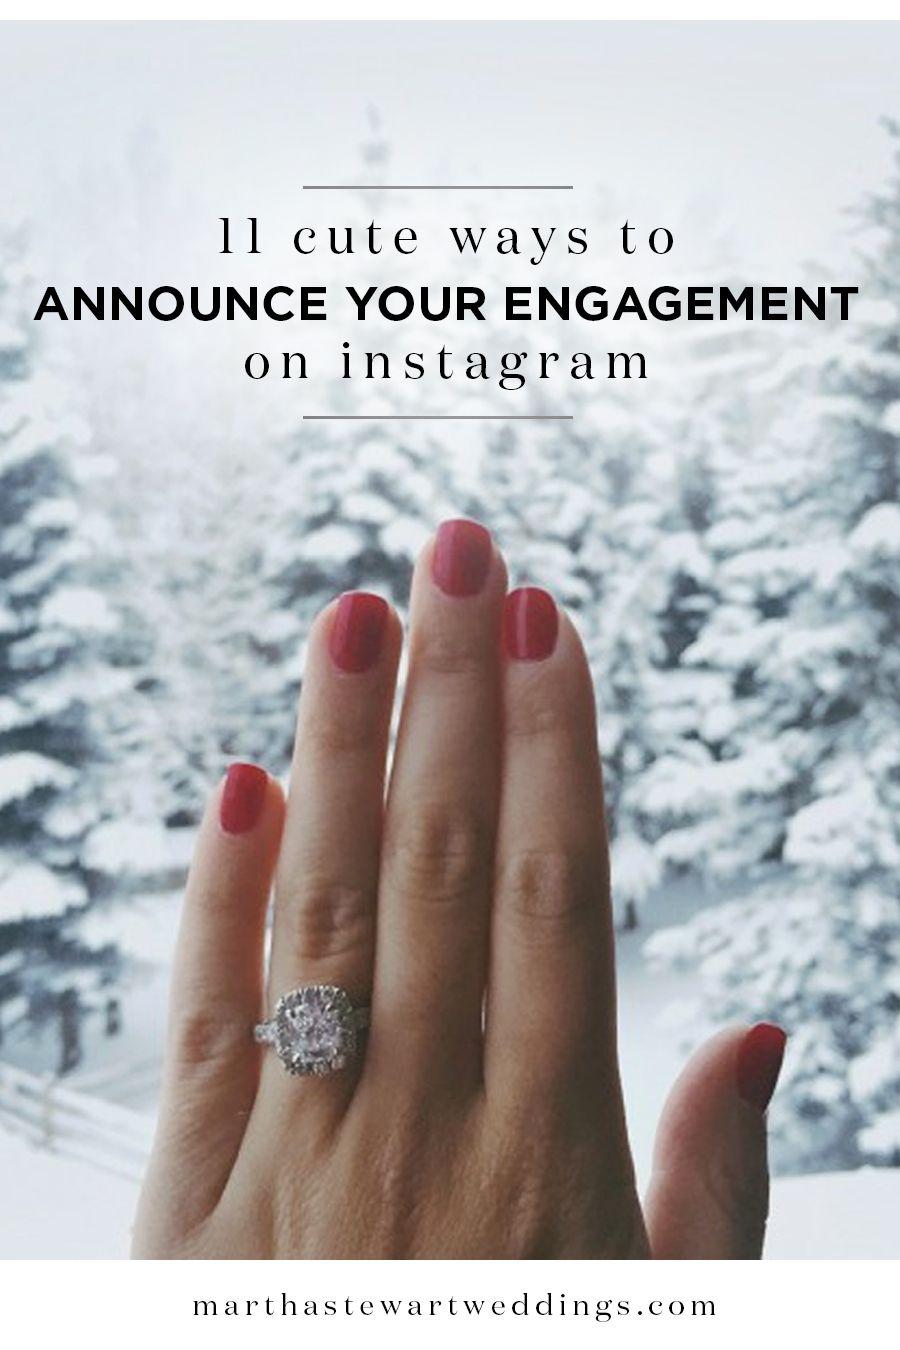 Engagement Announcement On Facebook : engagement, announcement, facebook, Engagement, Rings